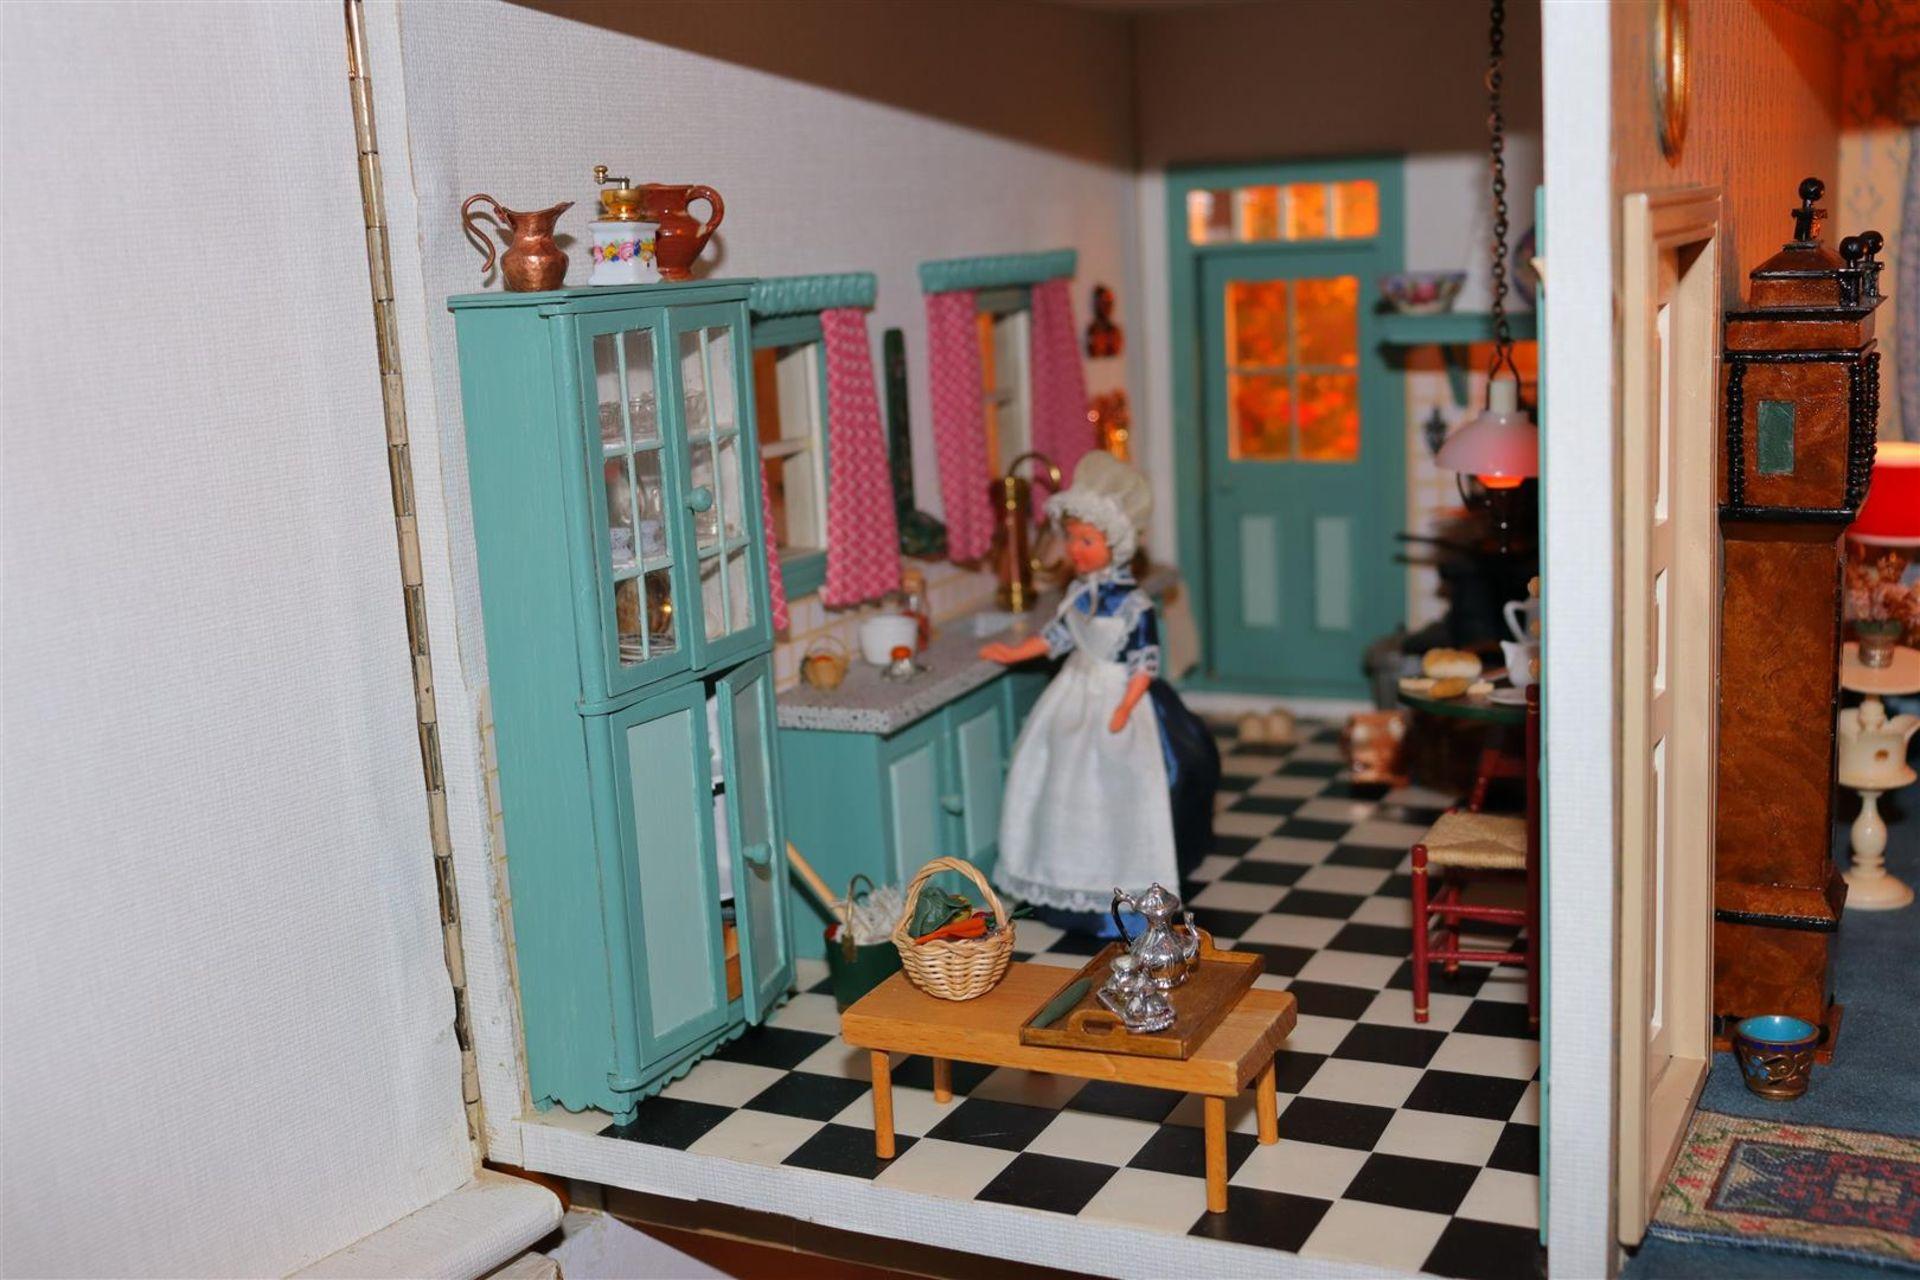 Dollhouse De Kettenborgh by Mrs. J C Wirix Kettenborg - Image 79 of 106